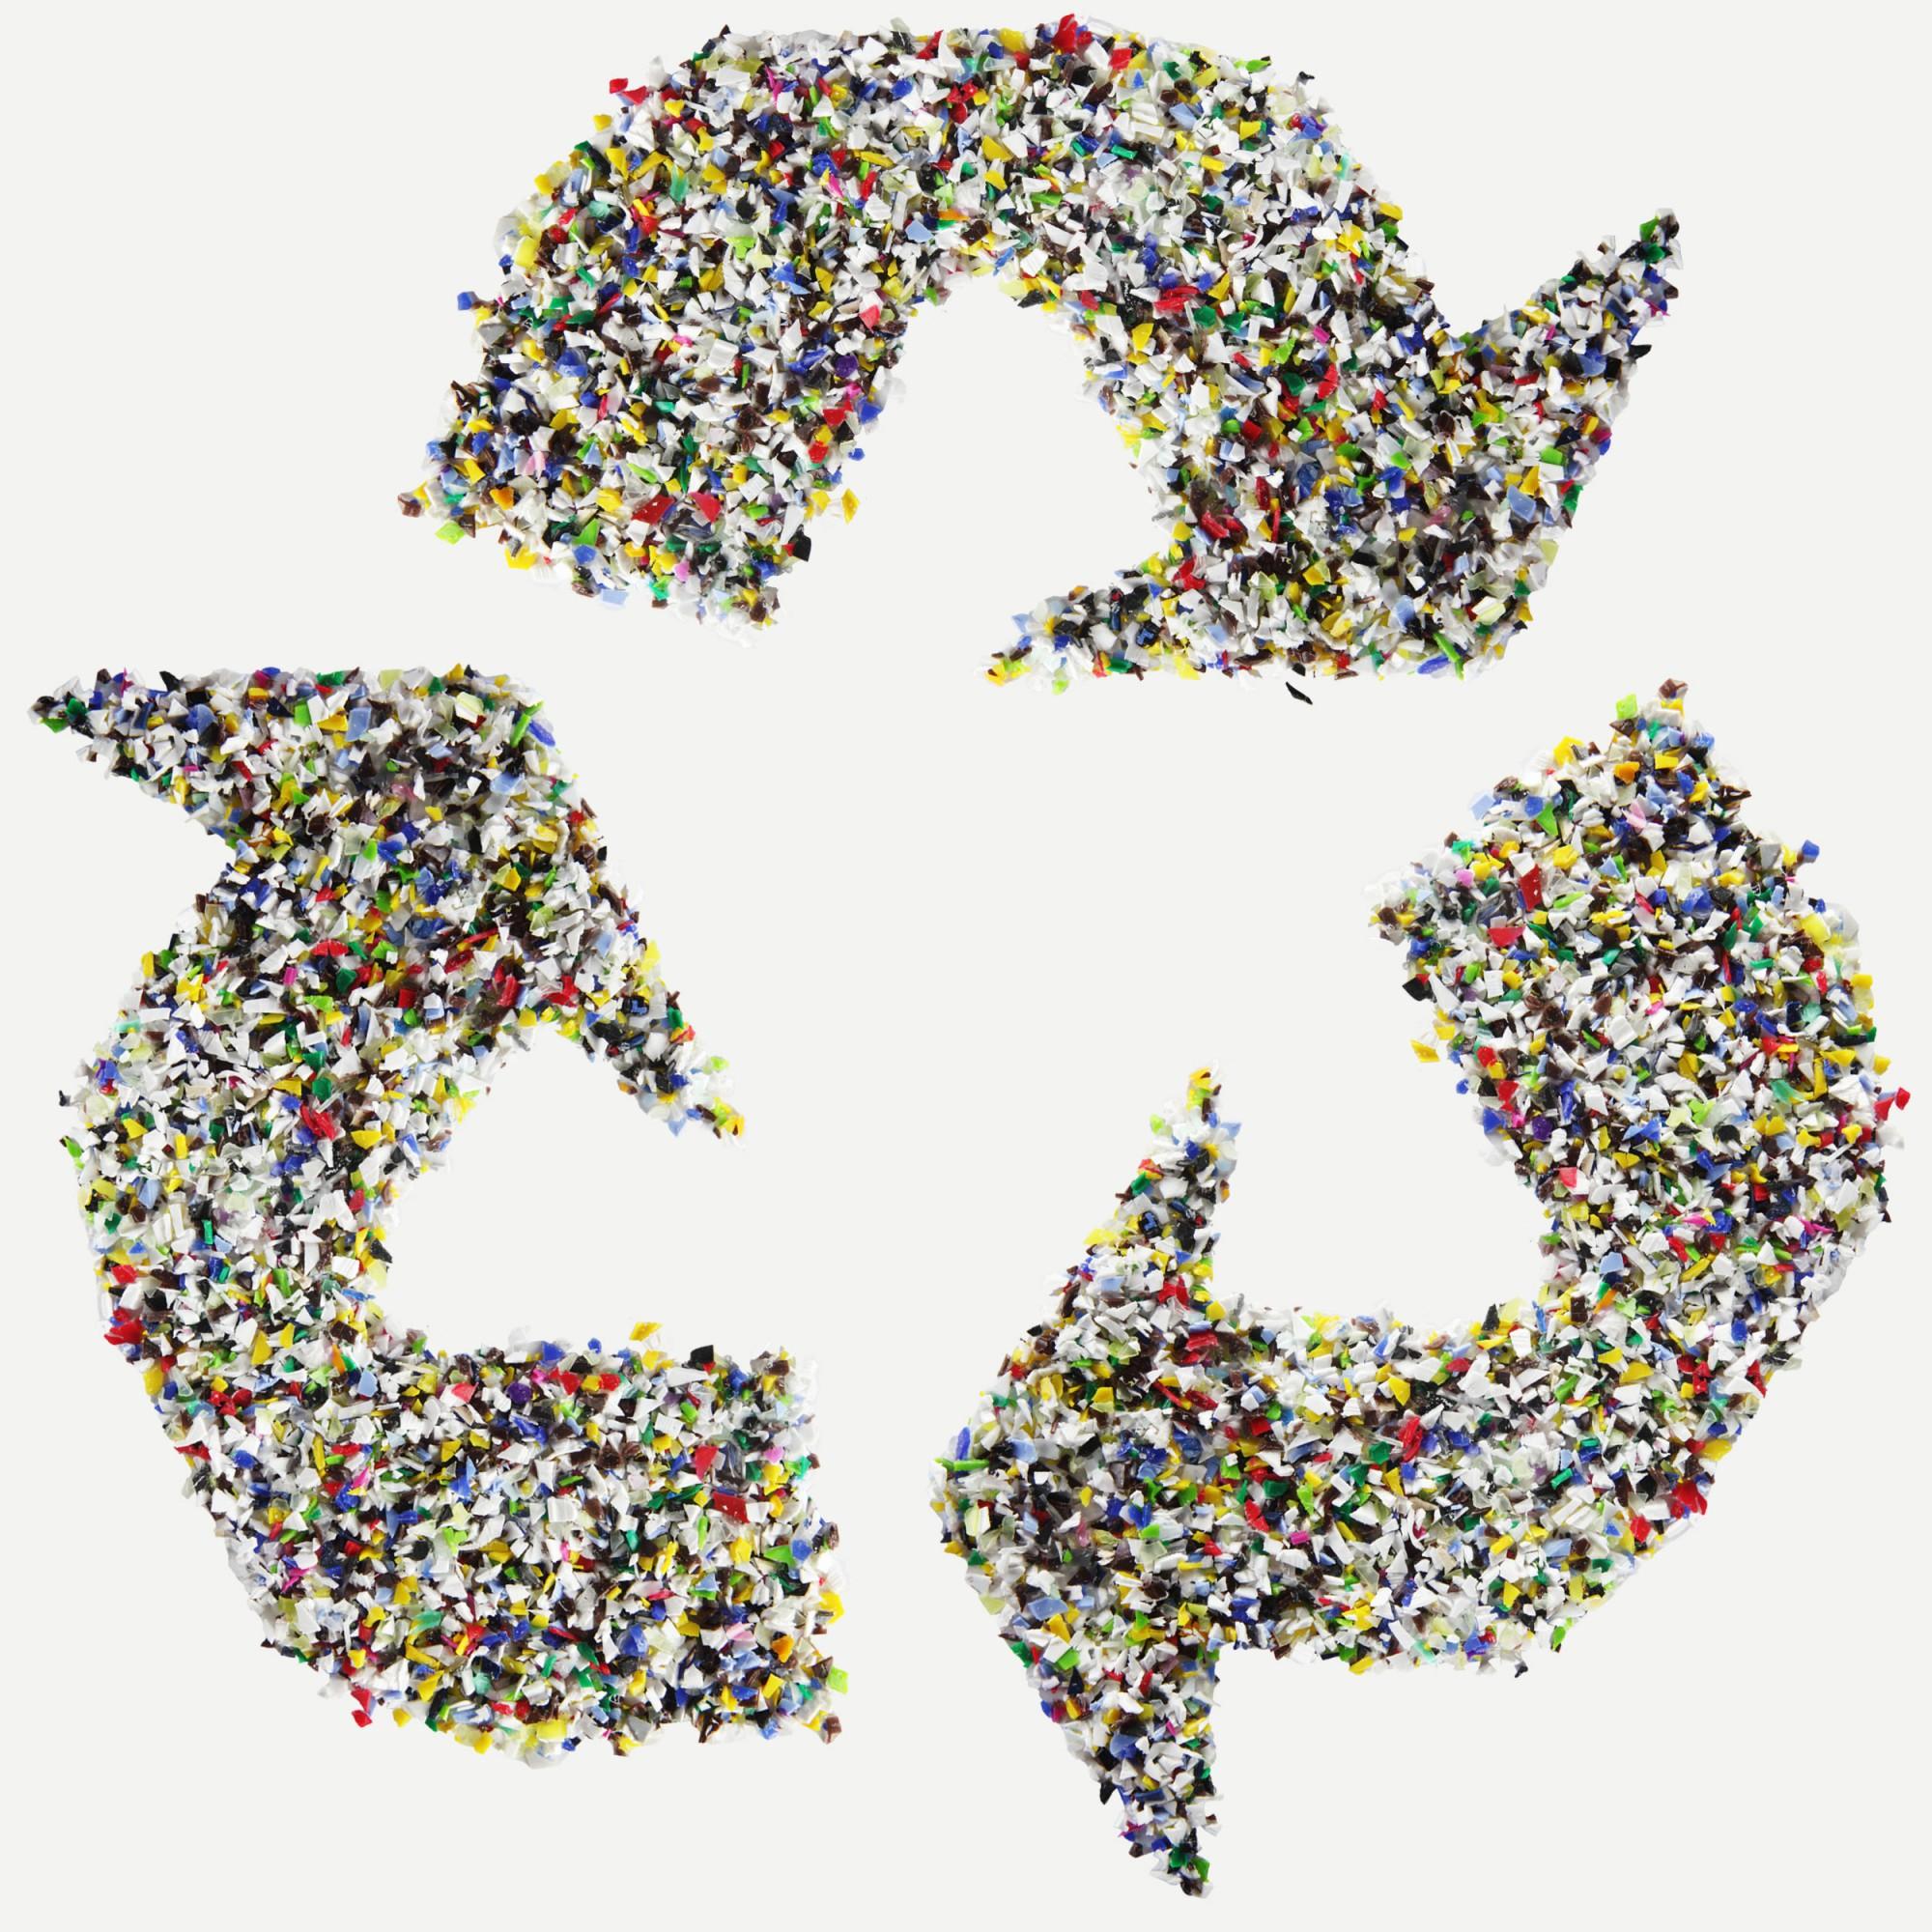 Unternehmen-Umwelt_mH2500.png